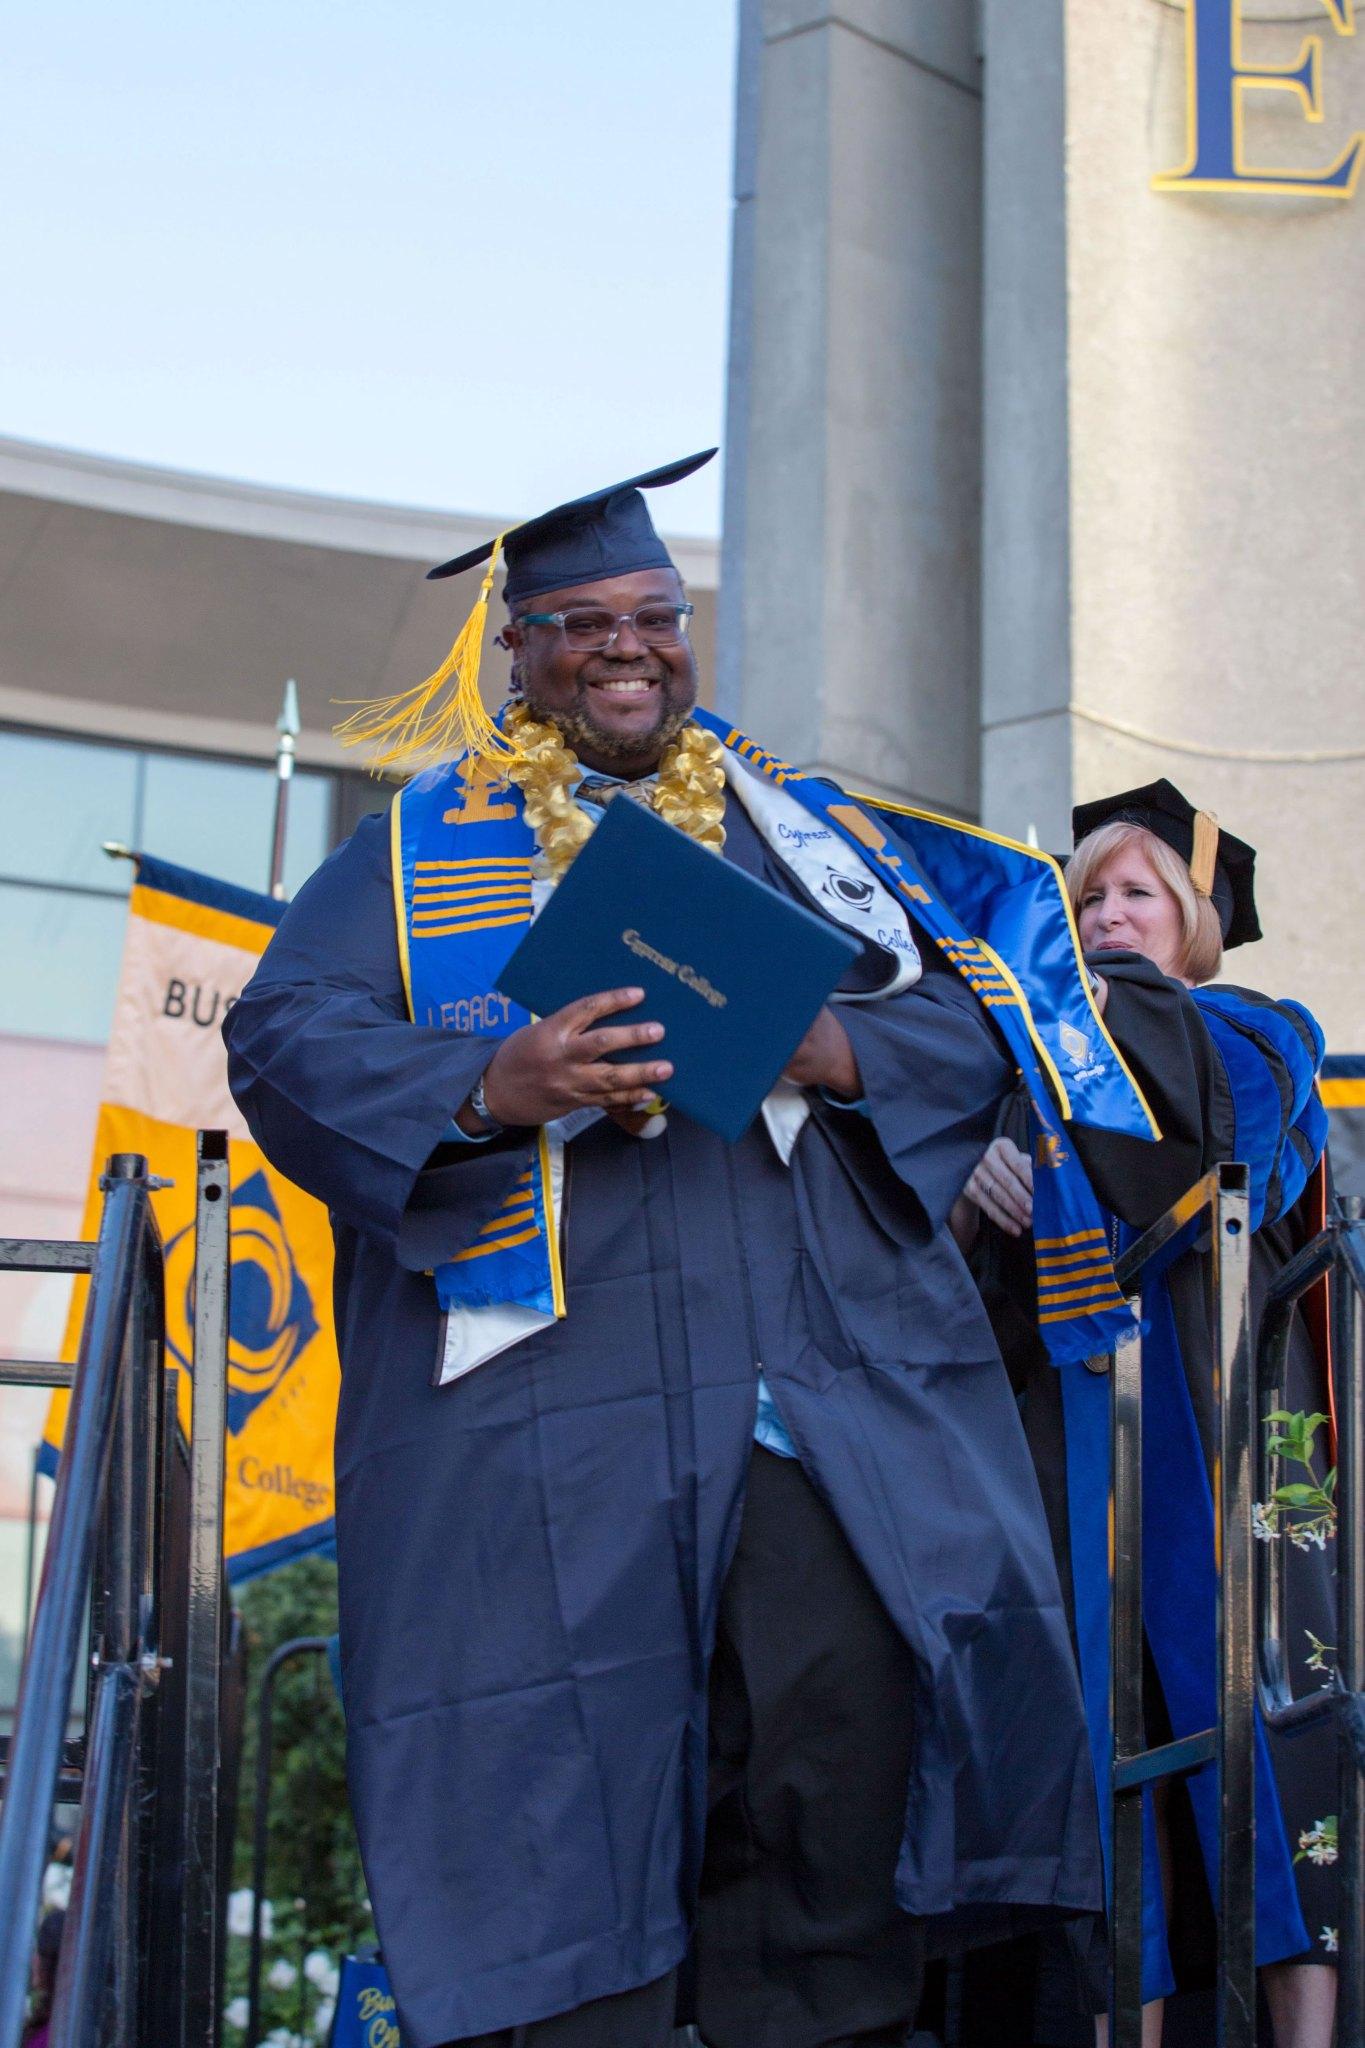 Student graduating, holding diploma